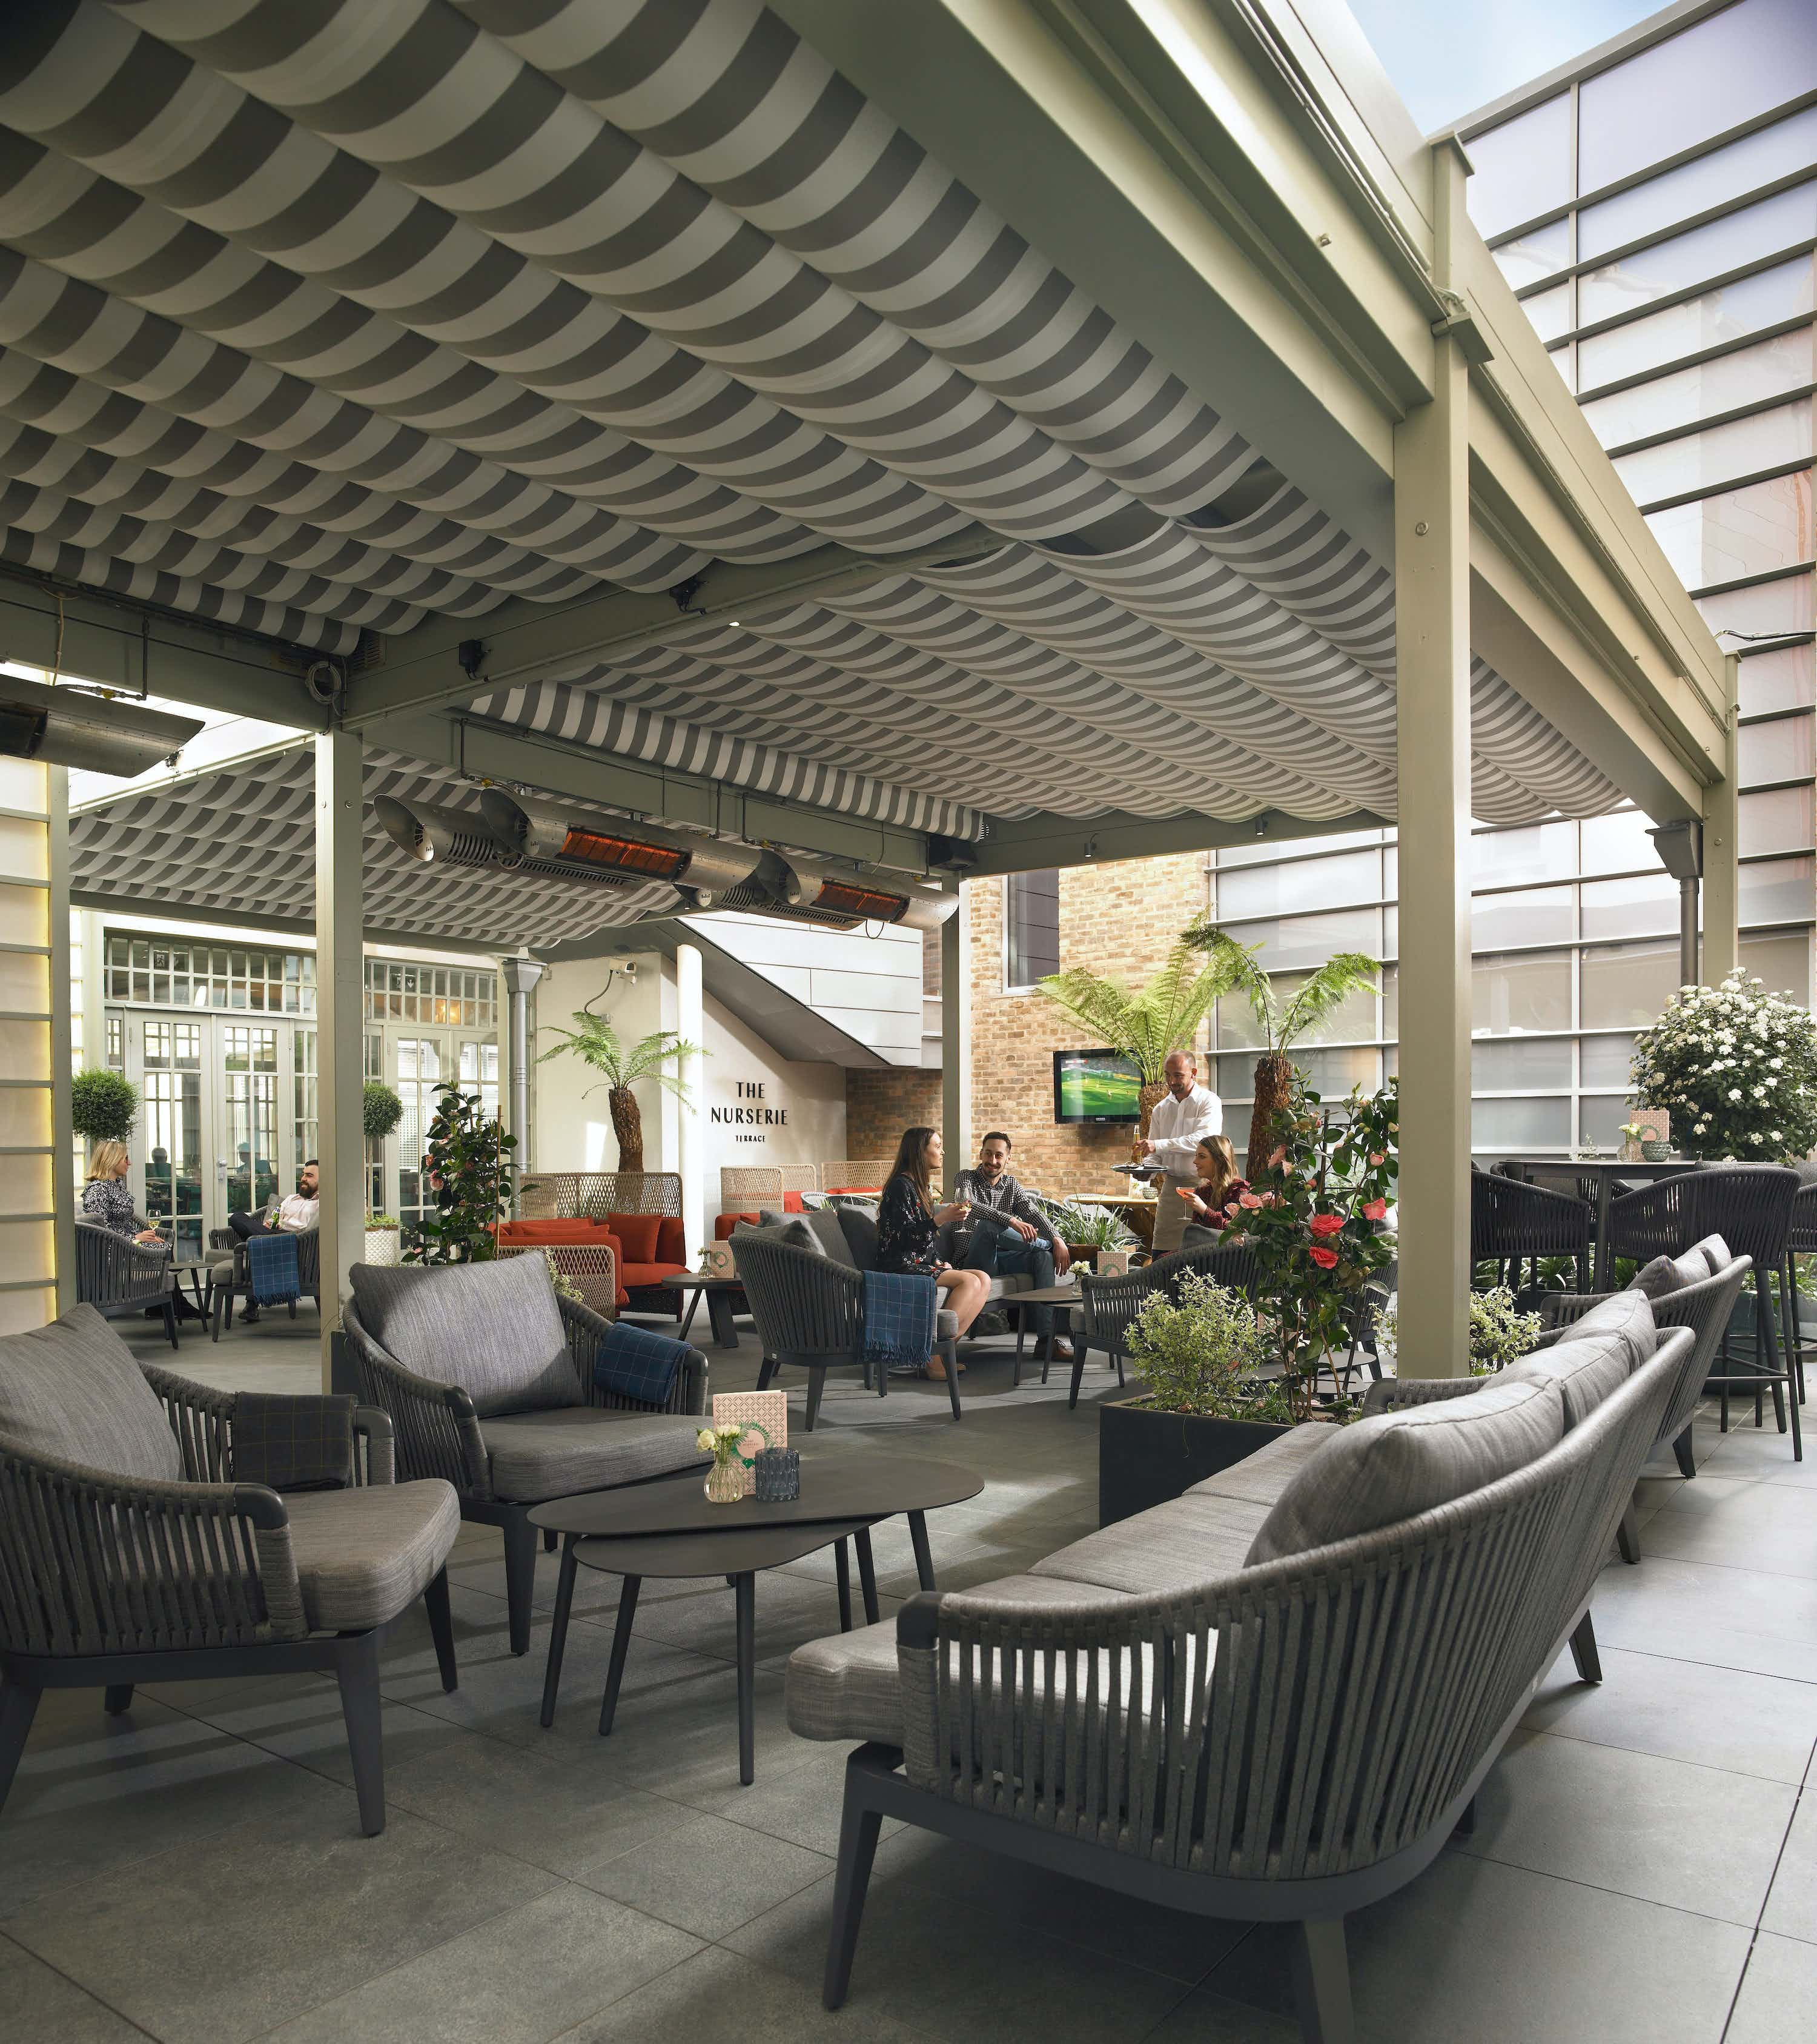 The Nursery, Dylan Hotel